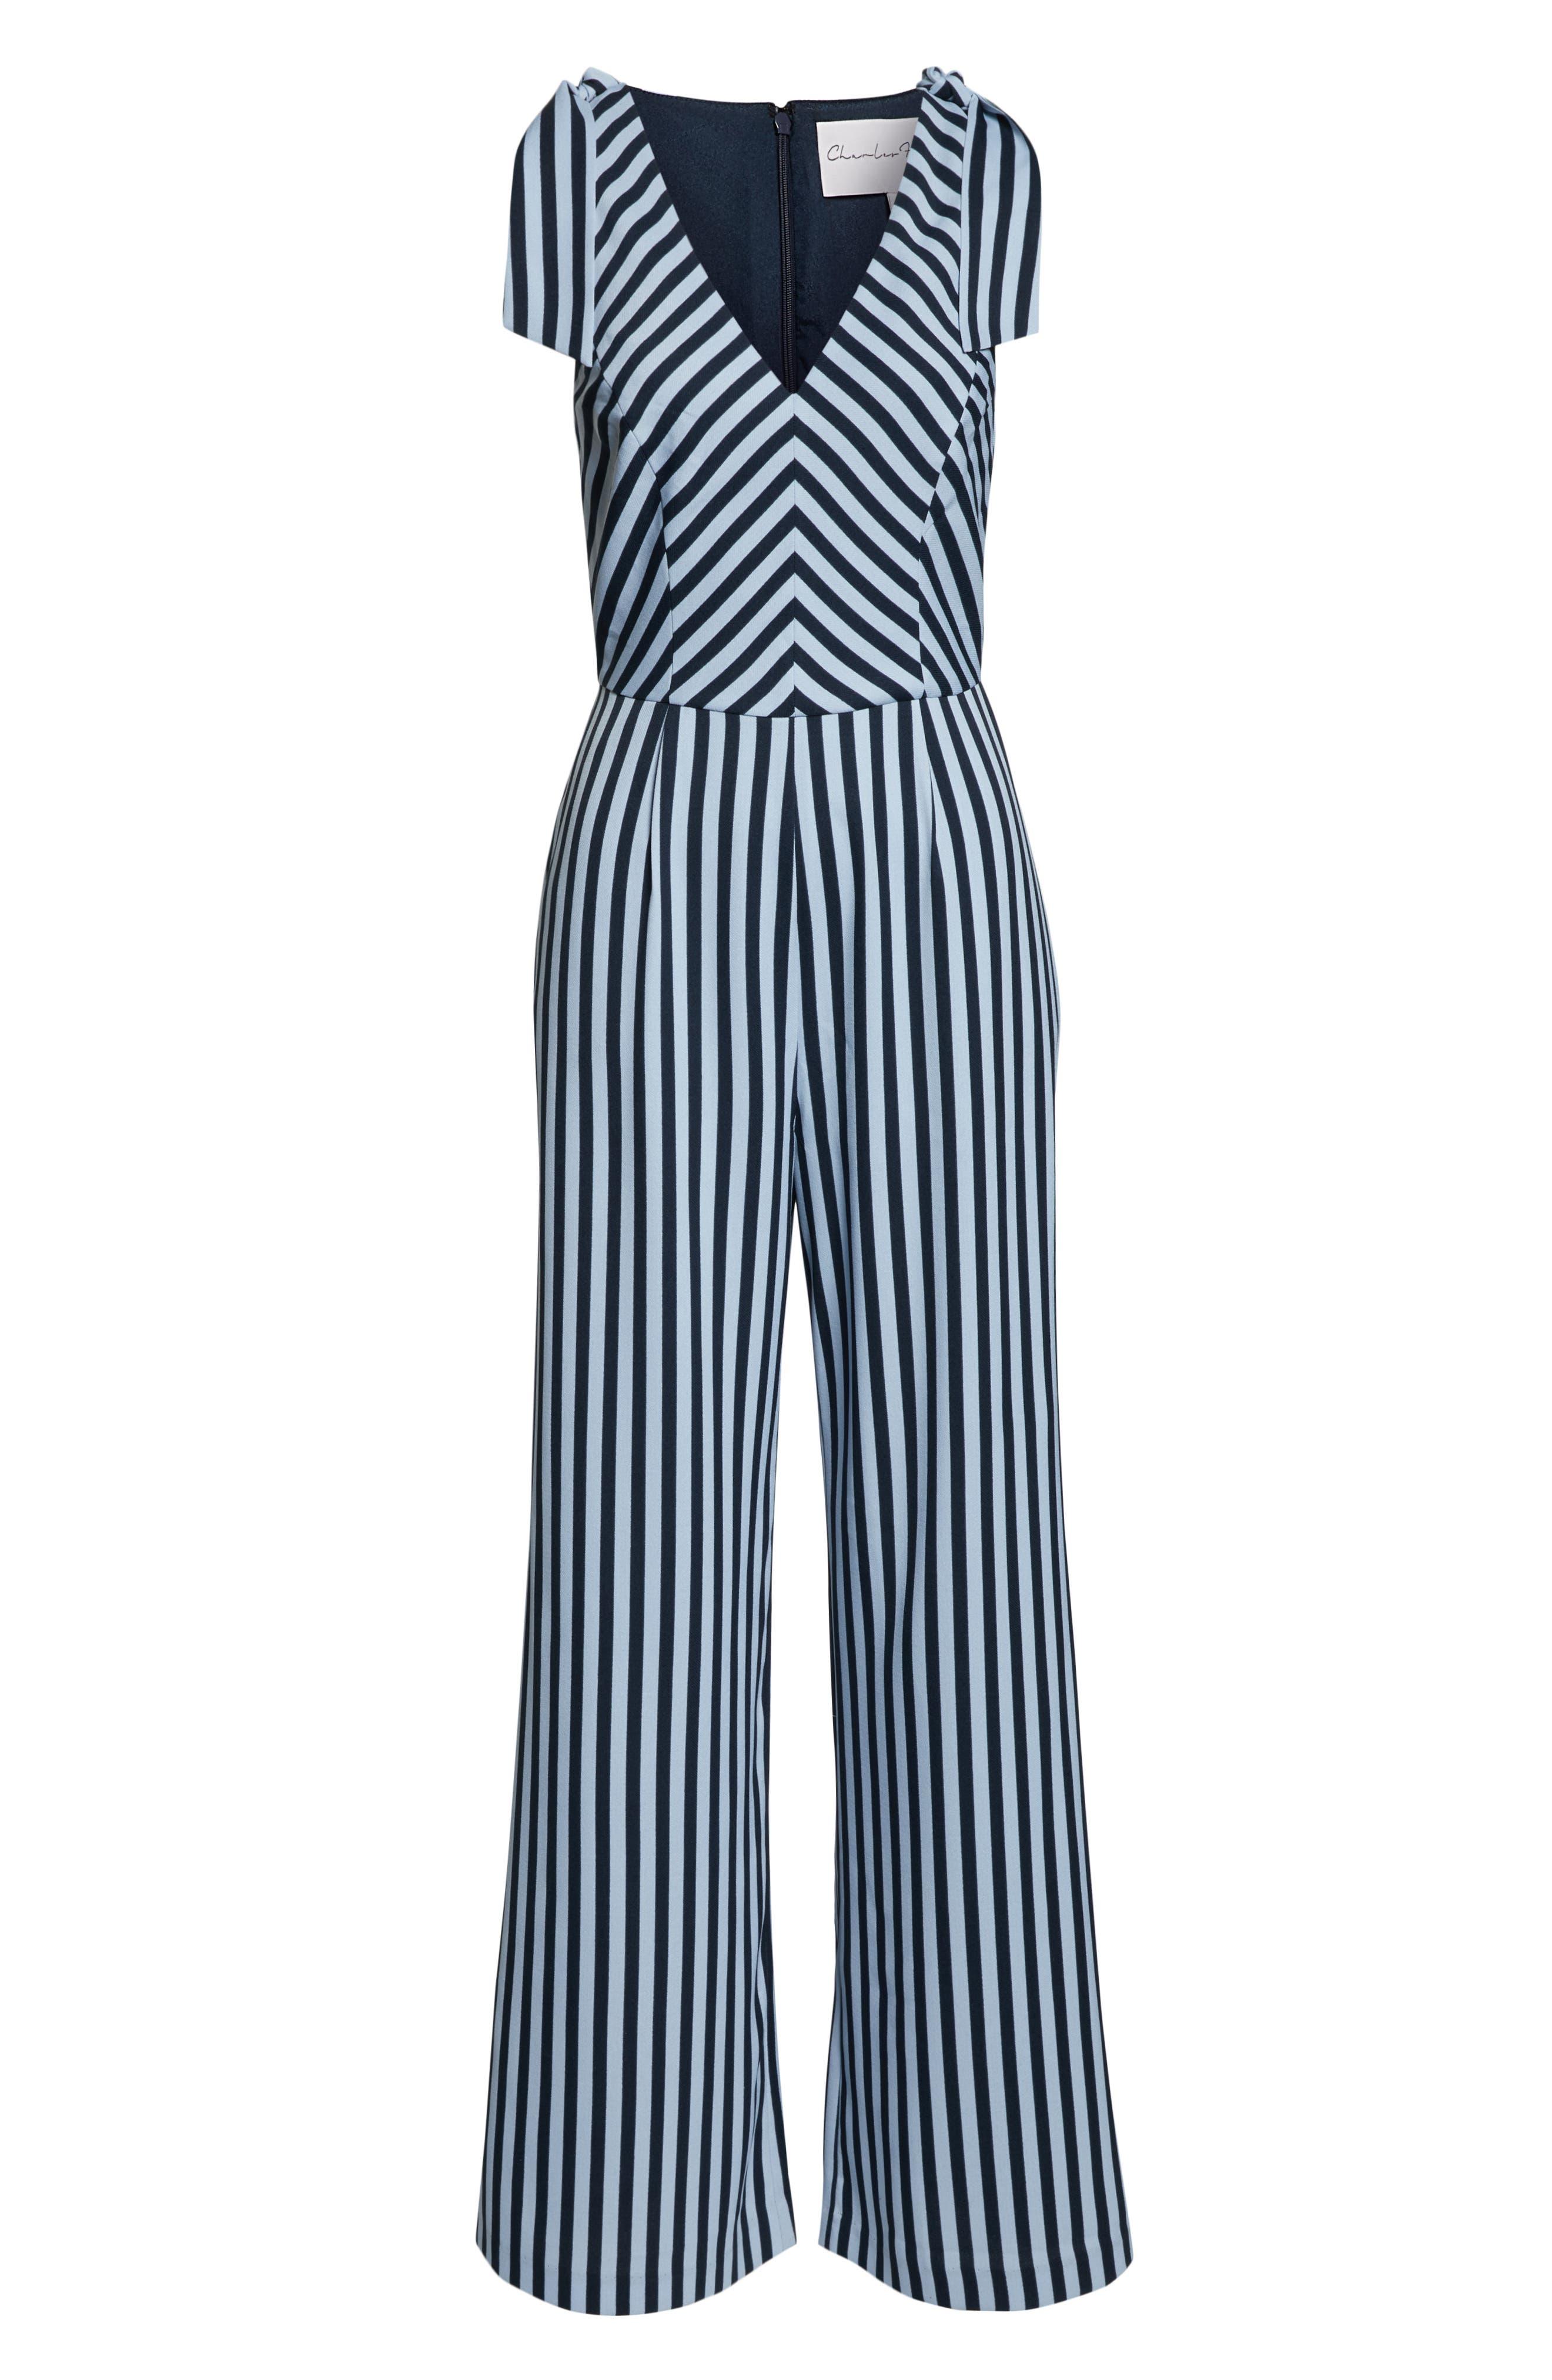 CHARLES HENRY, Stripe Tie Shoulder Jumpsuit, Alternate thumbnail 7, color, 400